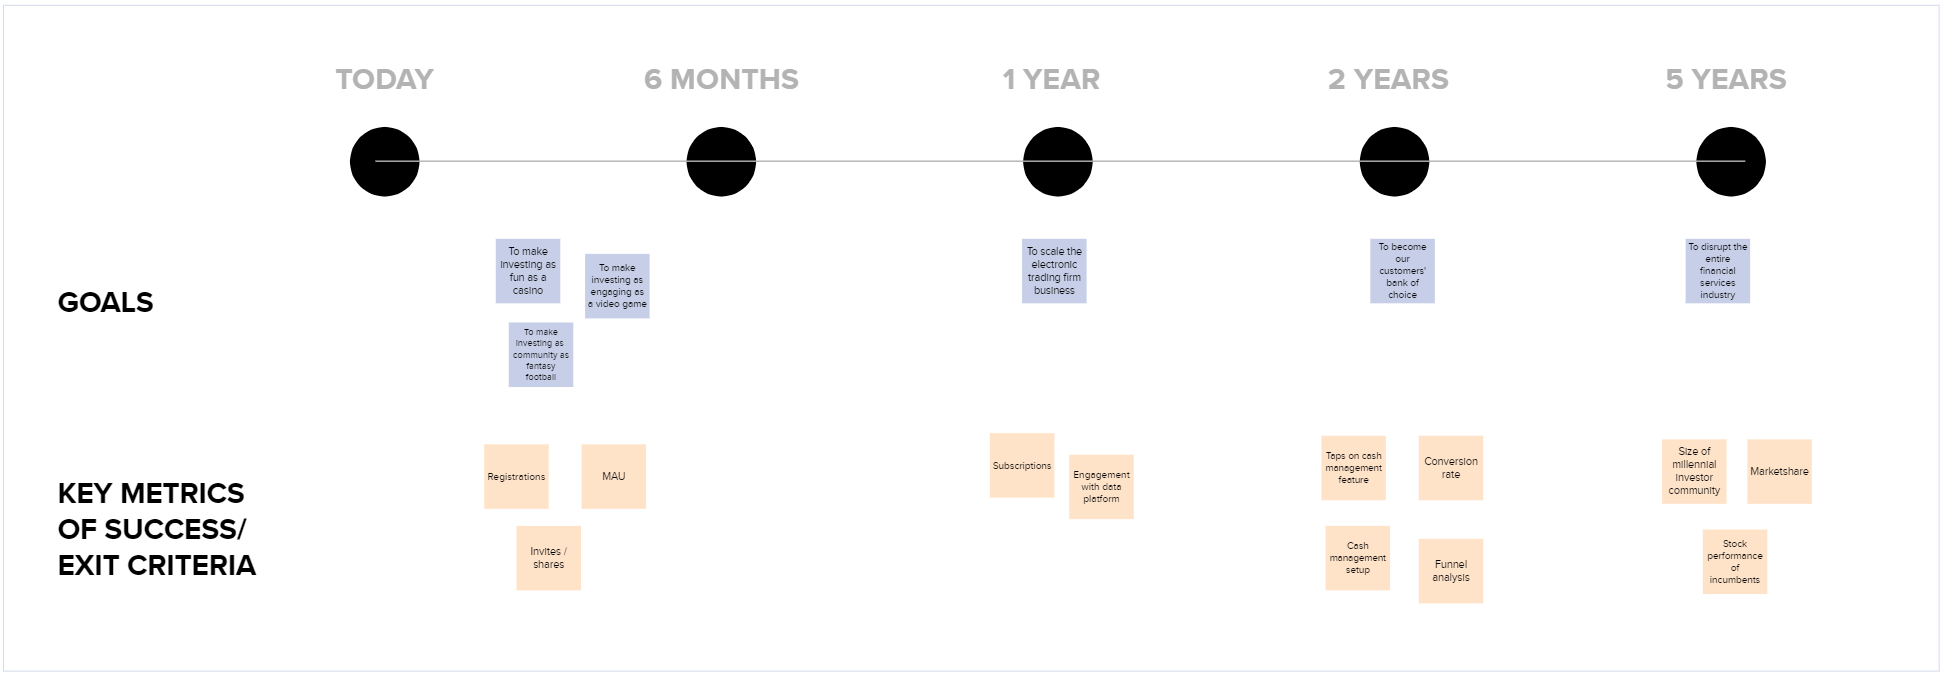 Goals and key success metrics for a product roadmap